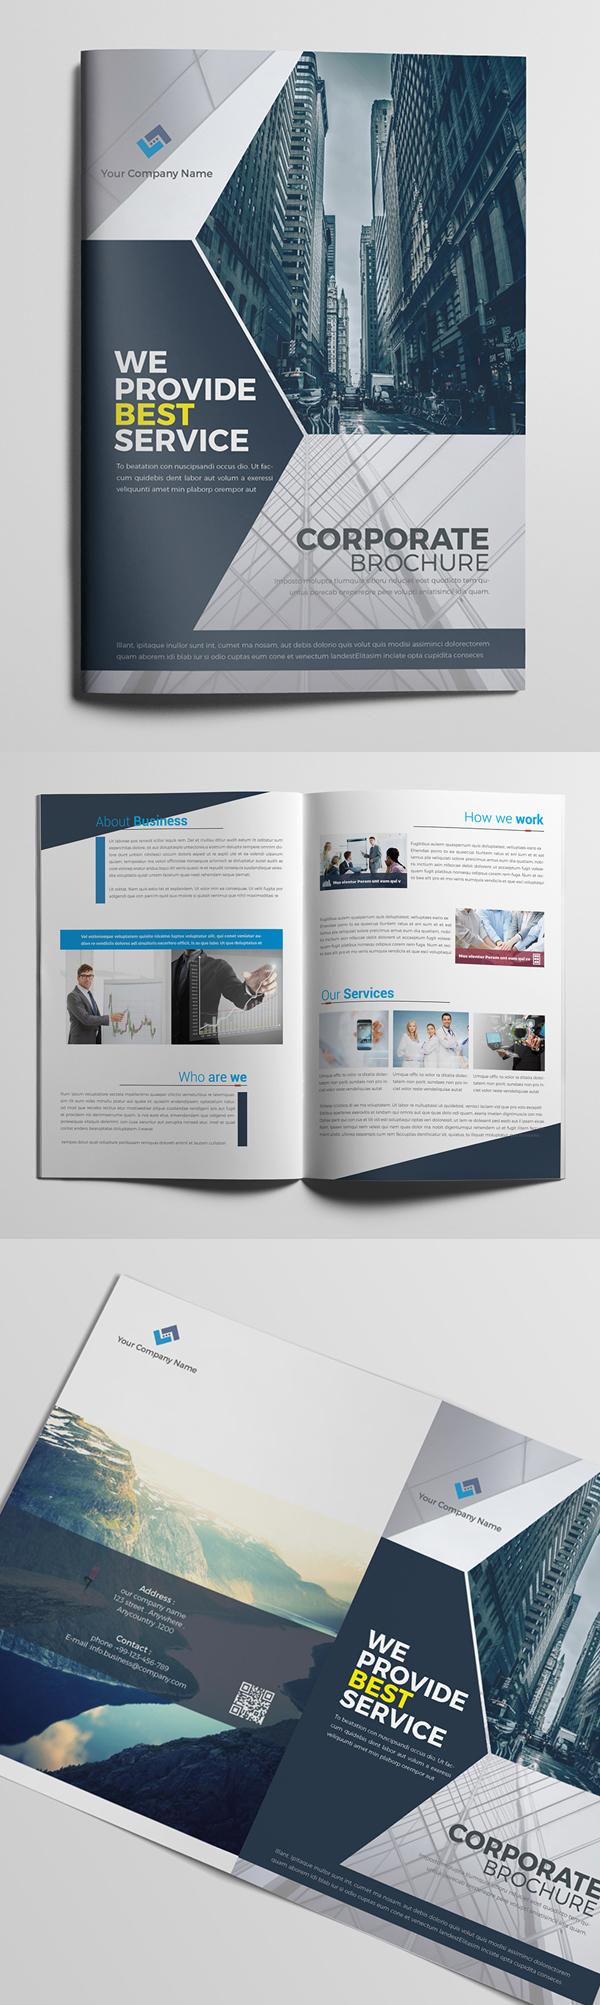 Corporate Brochure / Catalog Design